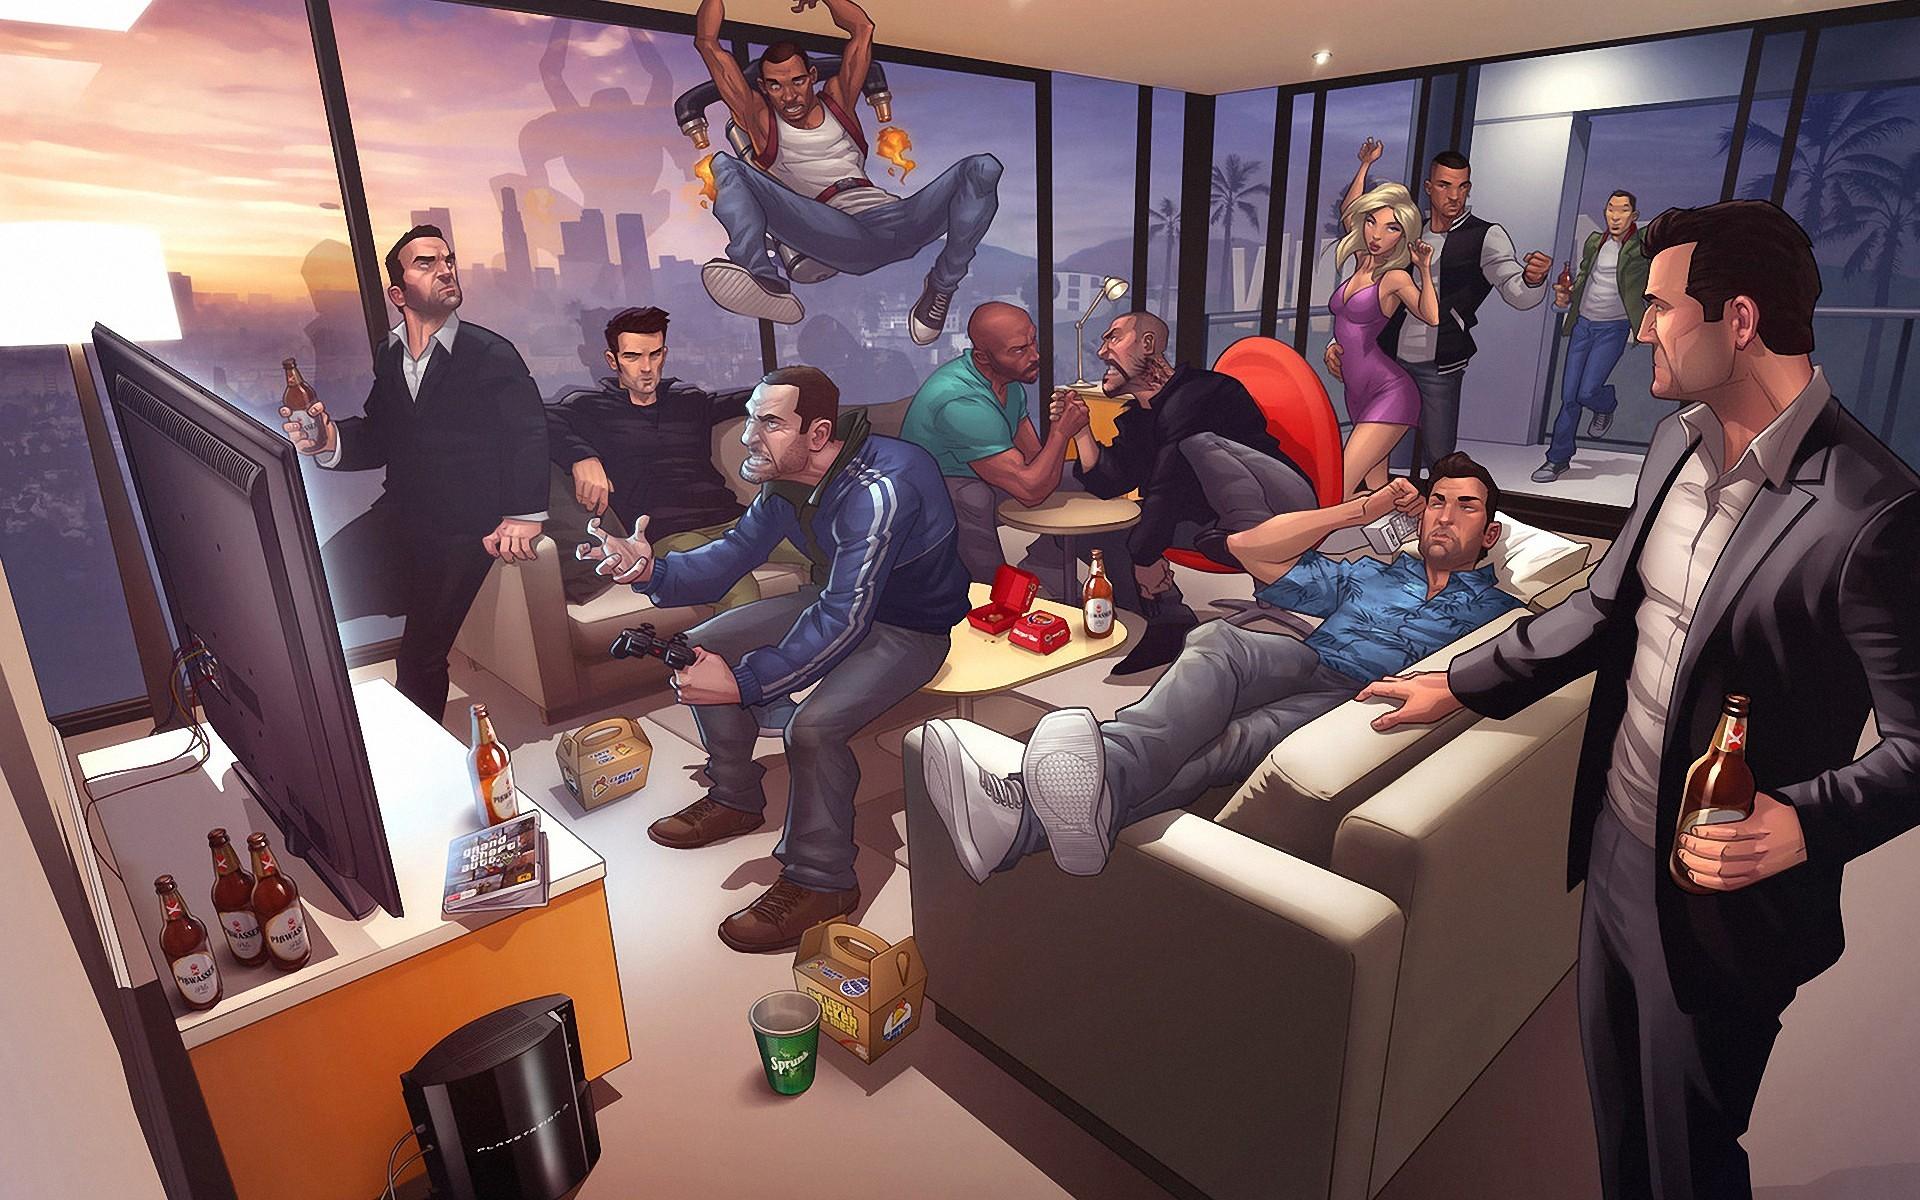 General 1920x1200 Grand Theft Auto Grand Theft Auto V video games digital art PlayStation 3 jetpack couch TV Grand Theft Auto III Grand Theft Auto IV Grand Theft Auto Vice City Grand Theft Auto San Andreas video game art video game man PC gaming